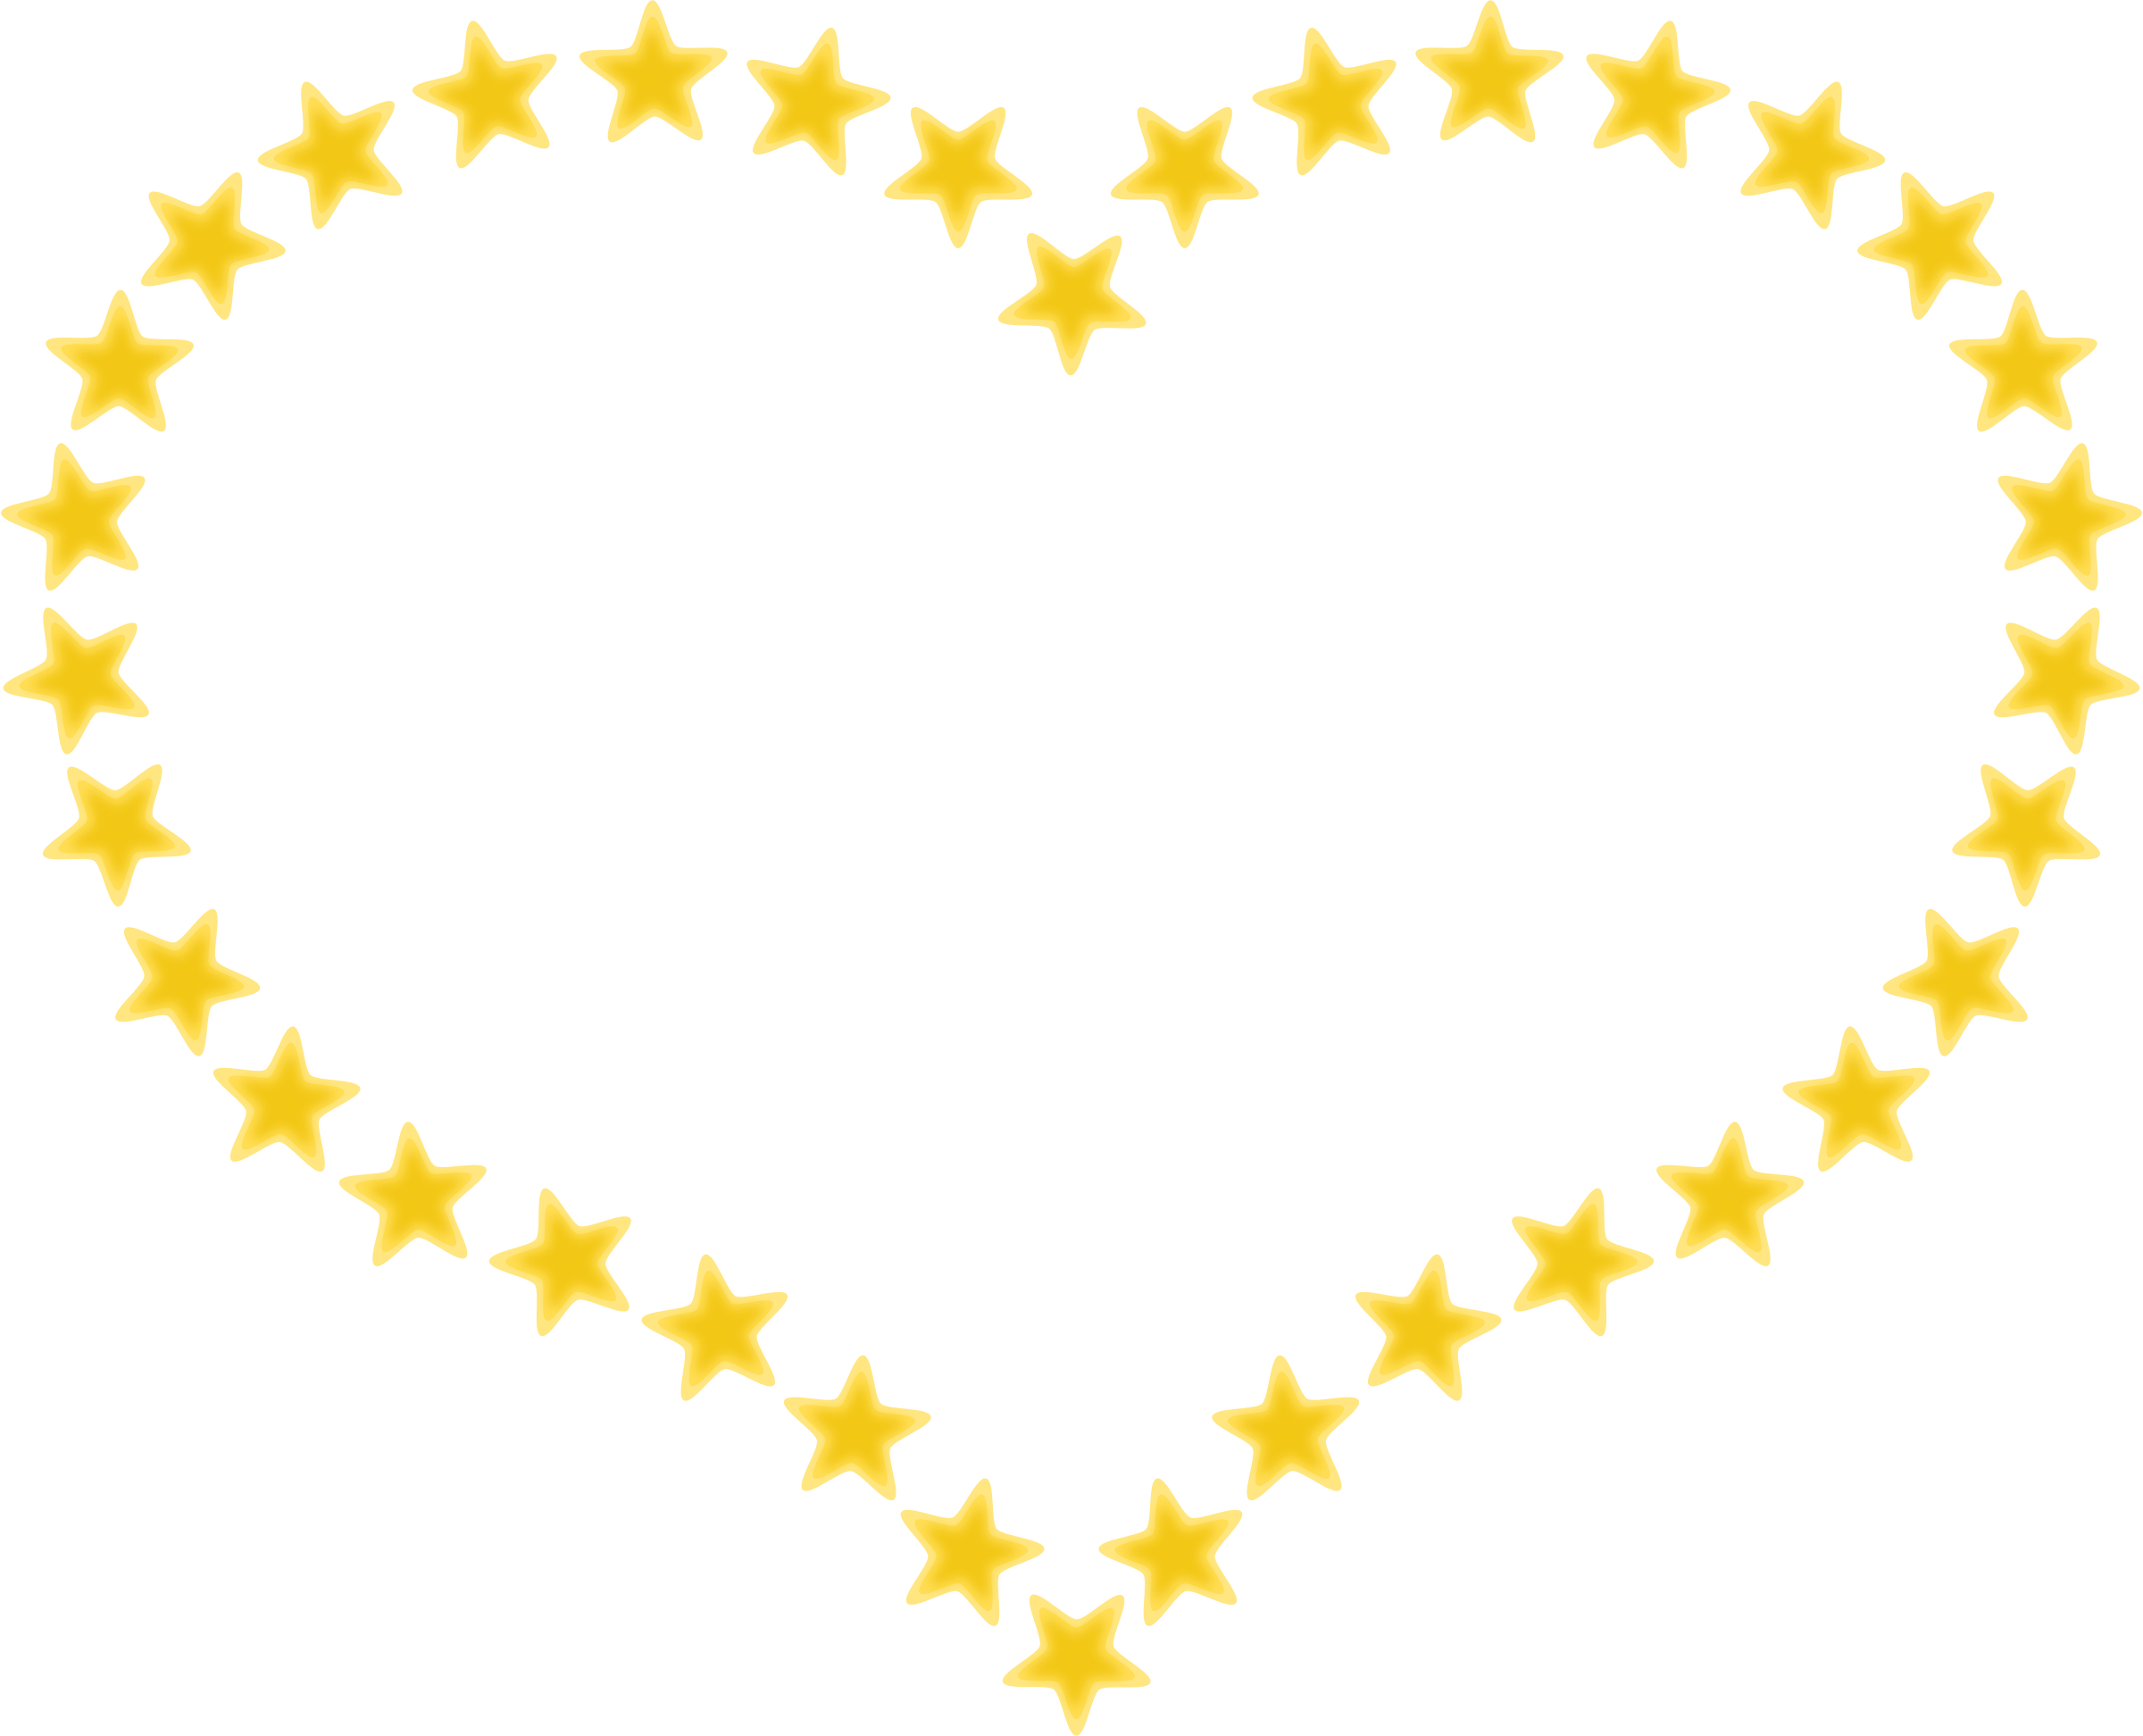 Heart-shaped clipart star shape #5